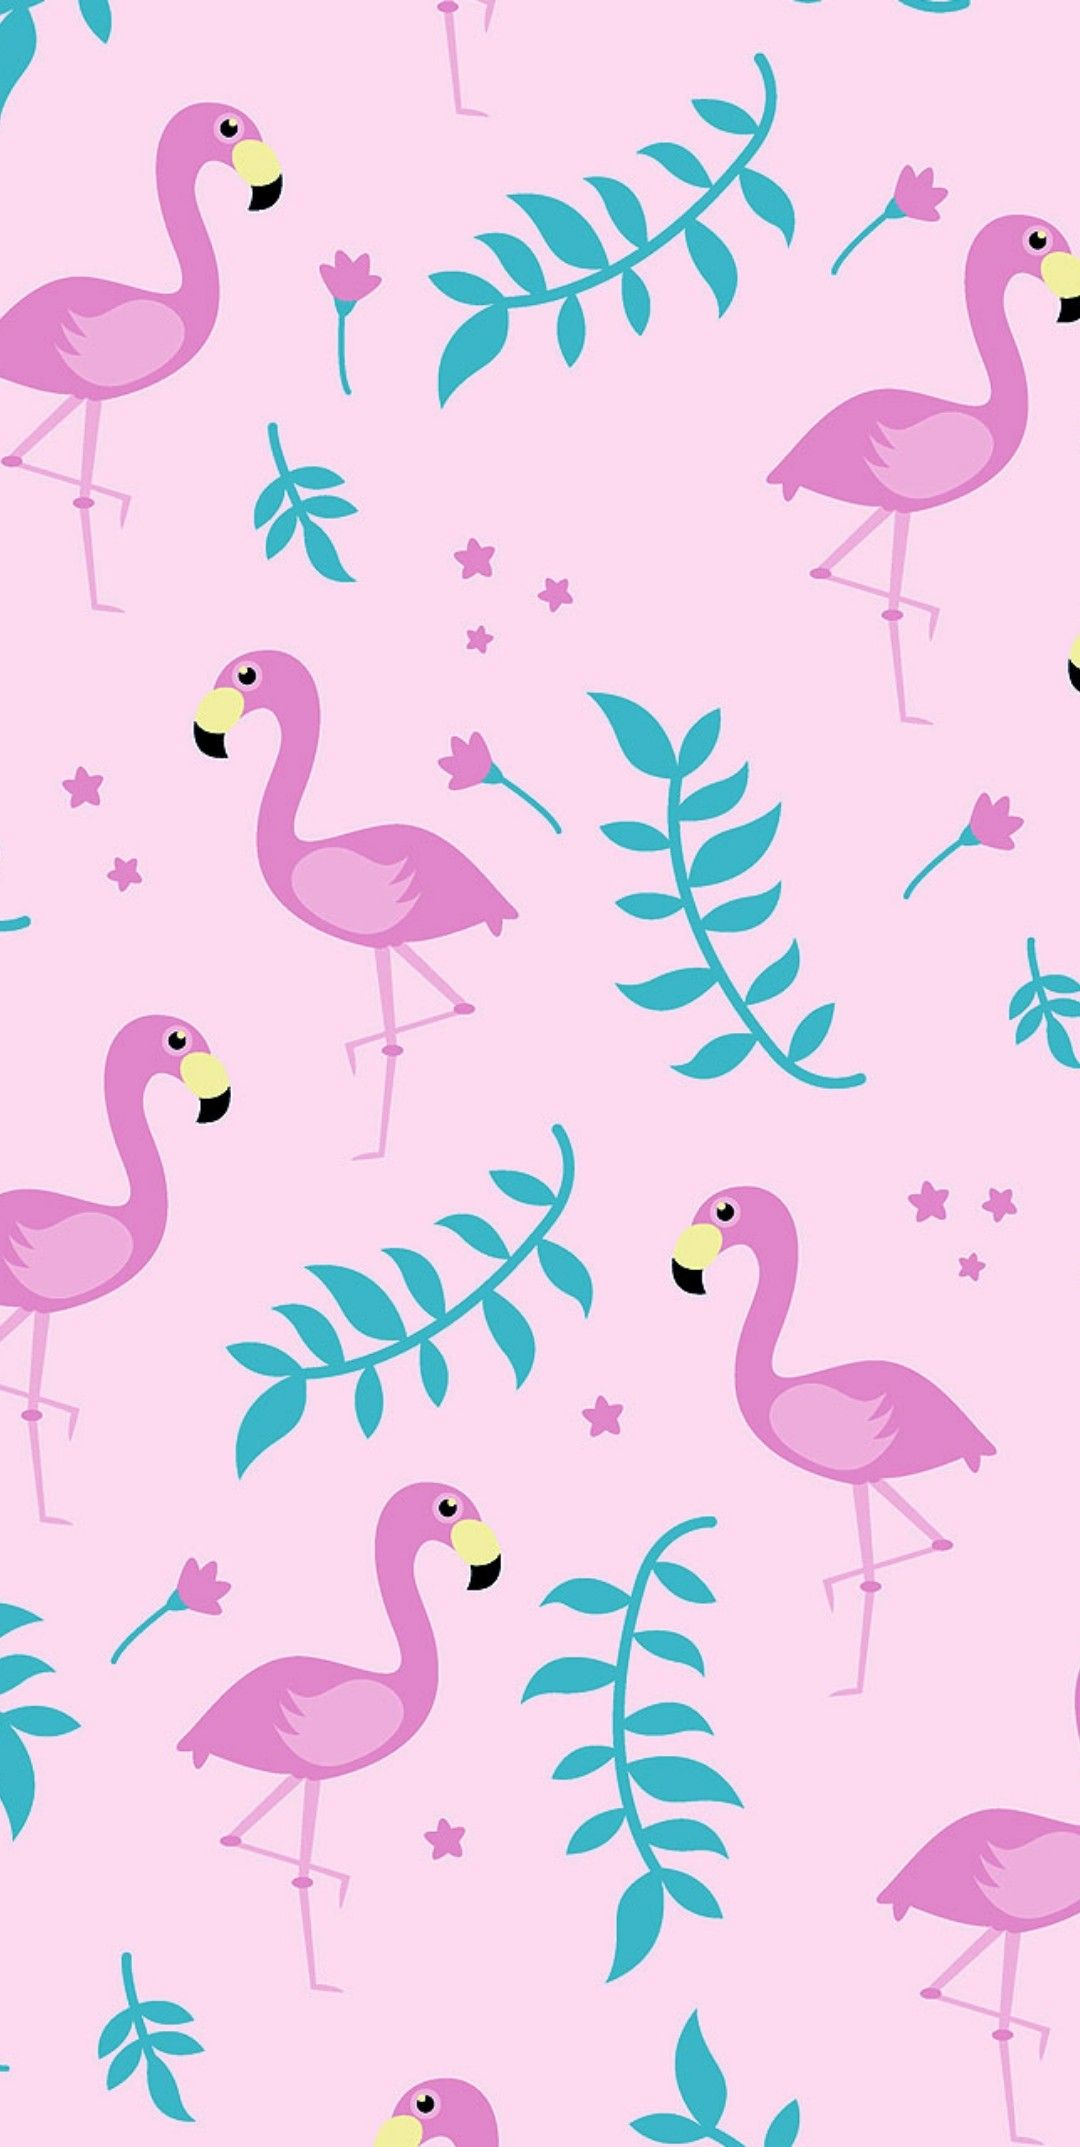 Flamingo Flamingo Wallpaper Iphone Wallpaper Cute Wallpaper Backgrounds Lock screen iphone 7 flamingo wallpaper